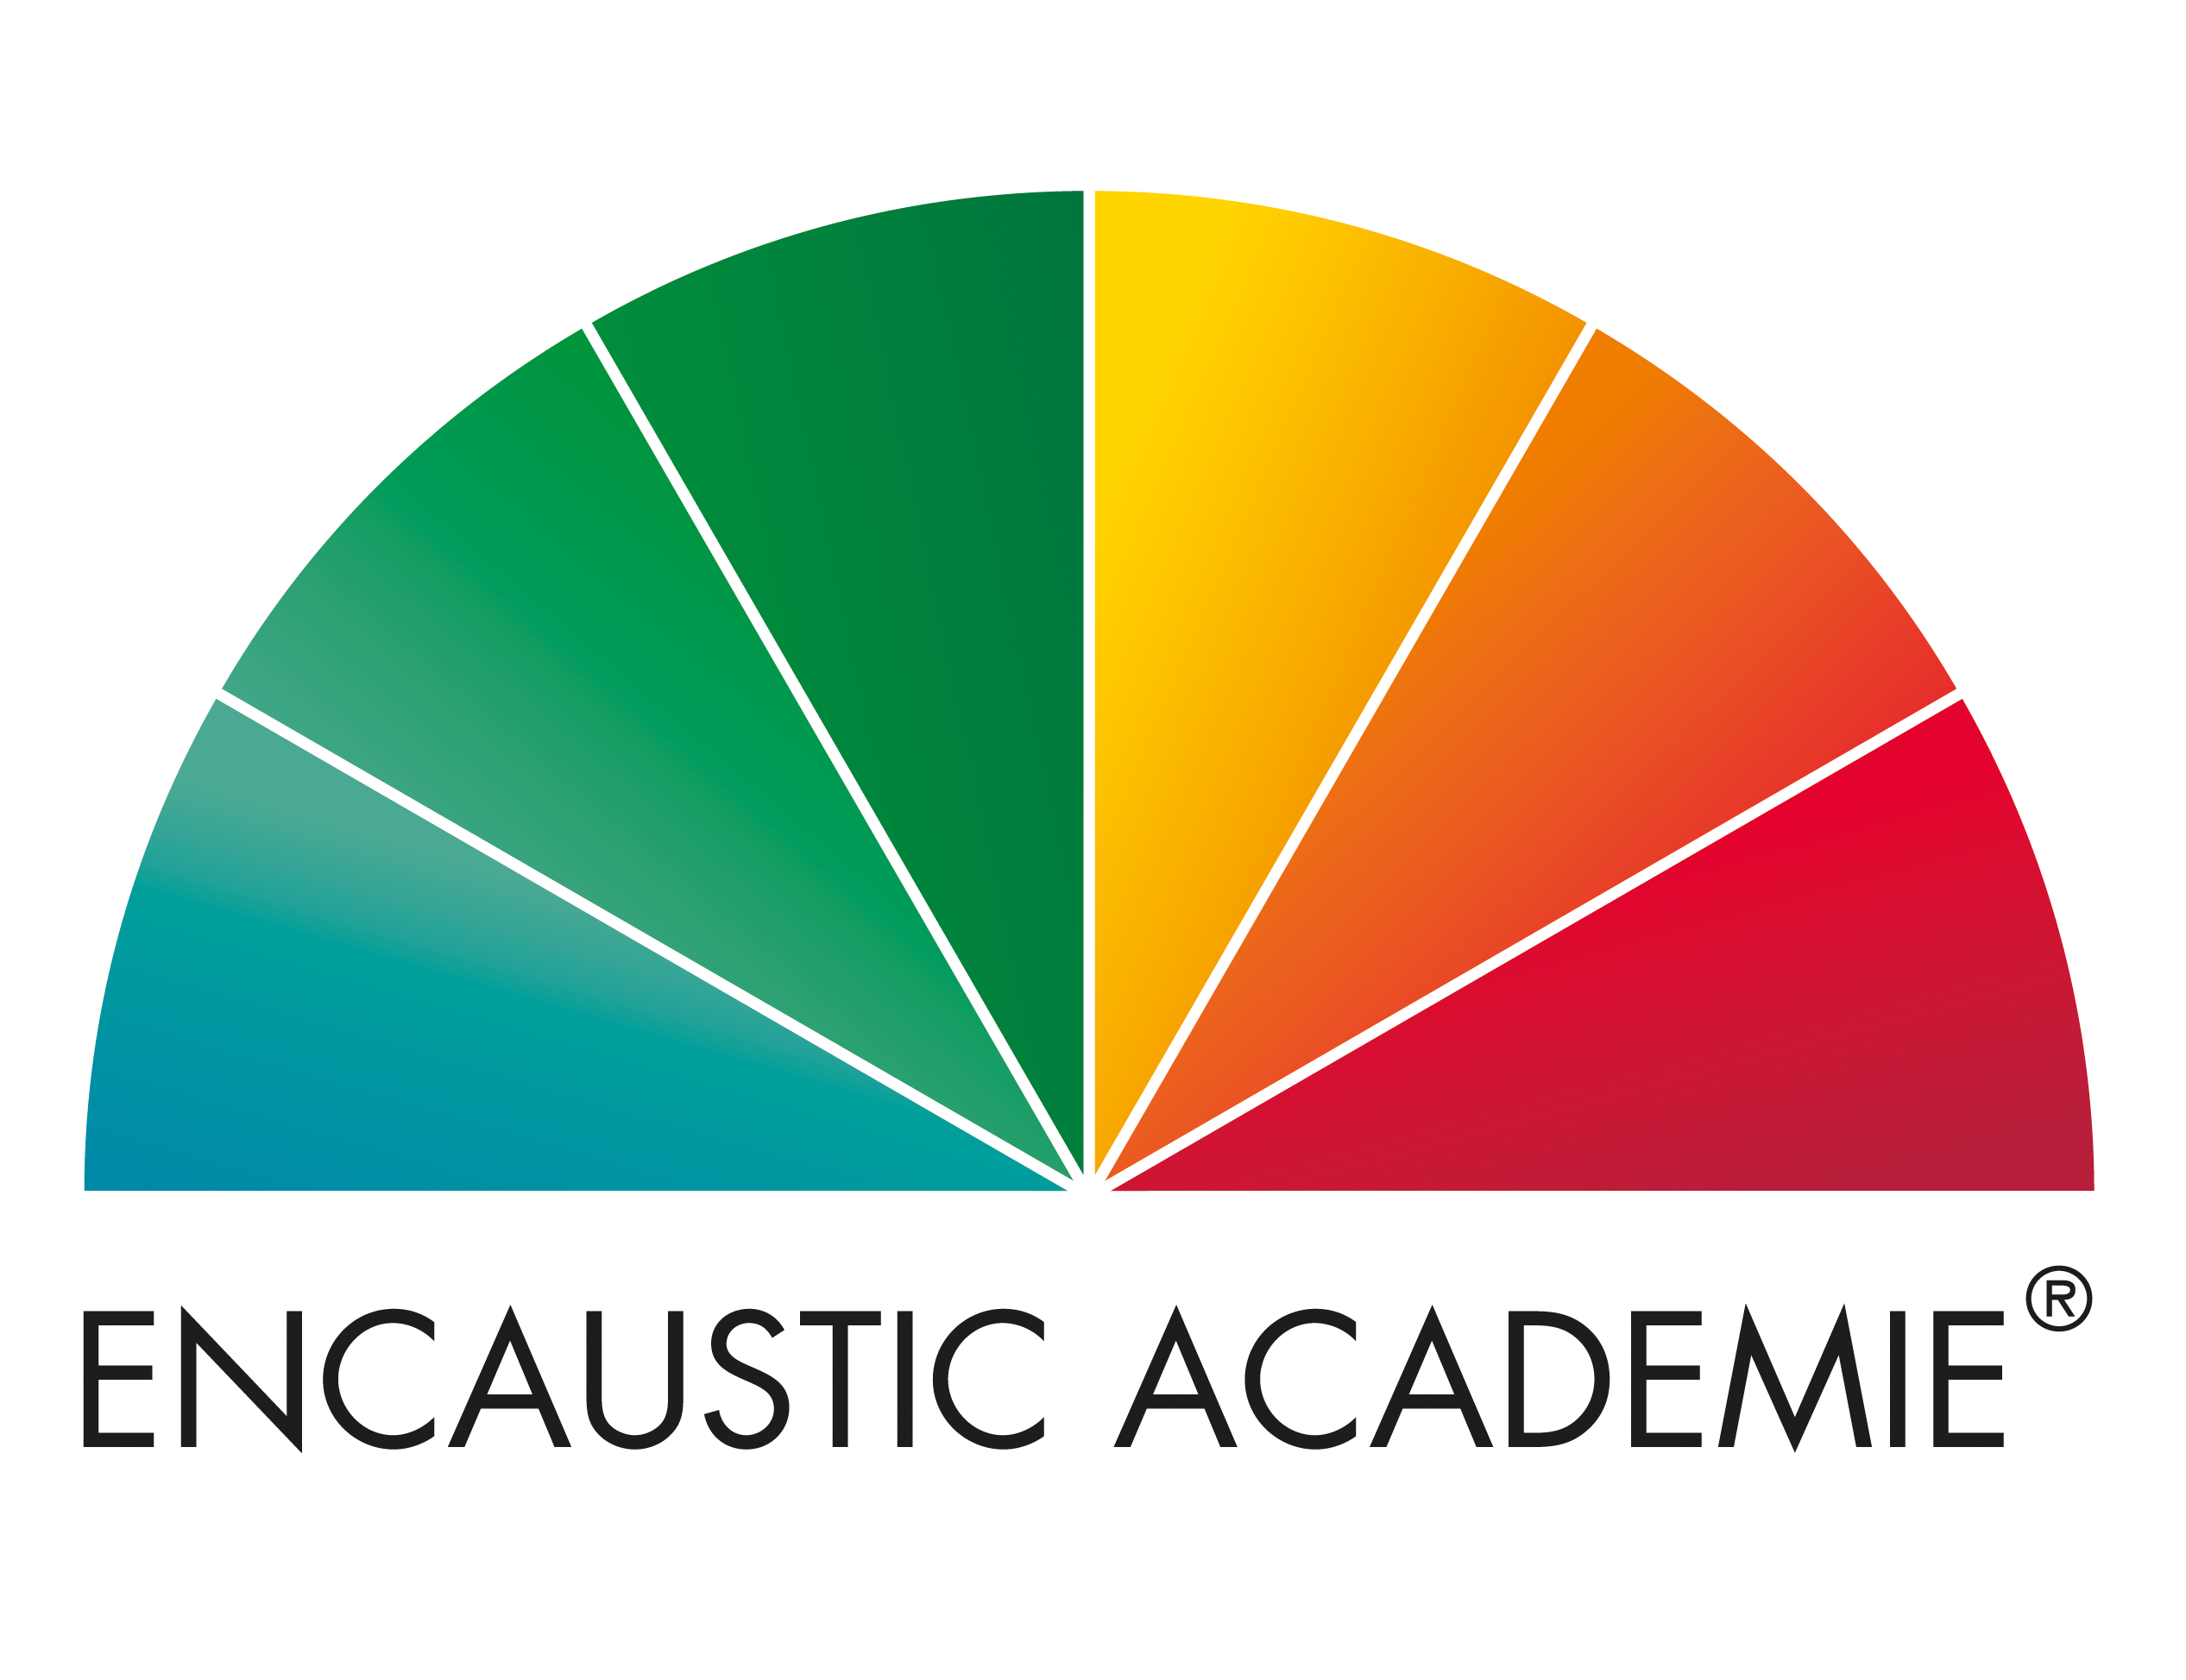 Encaustic-Academie